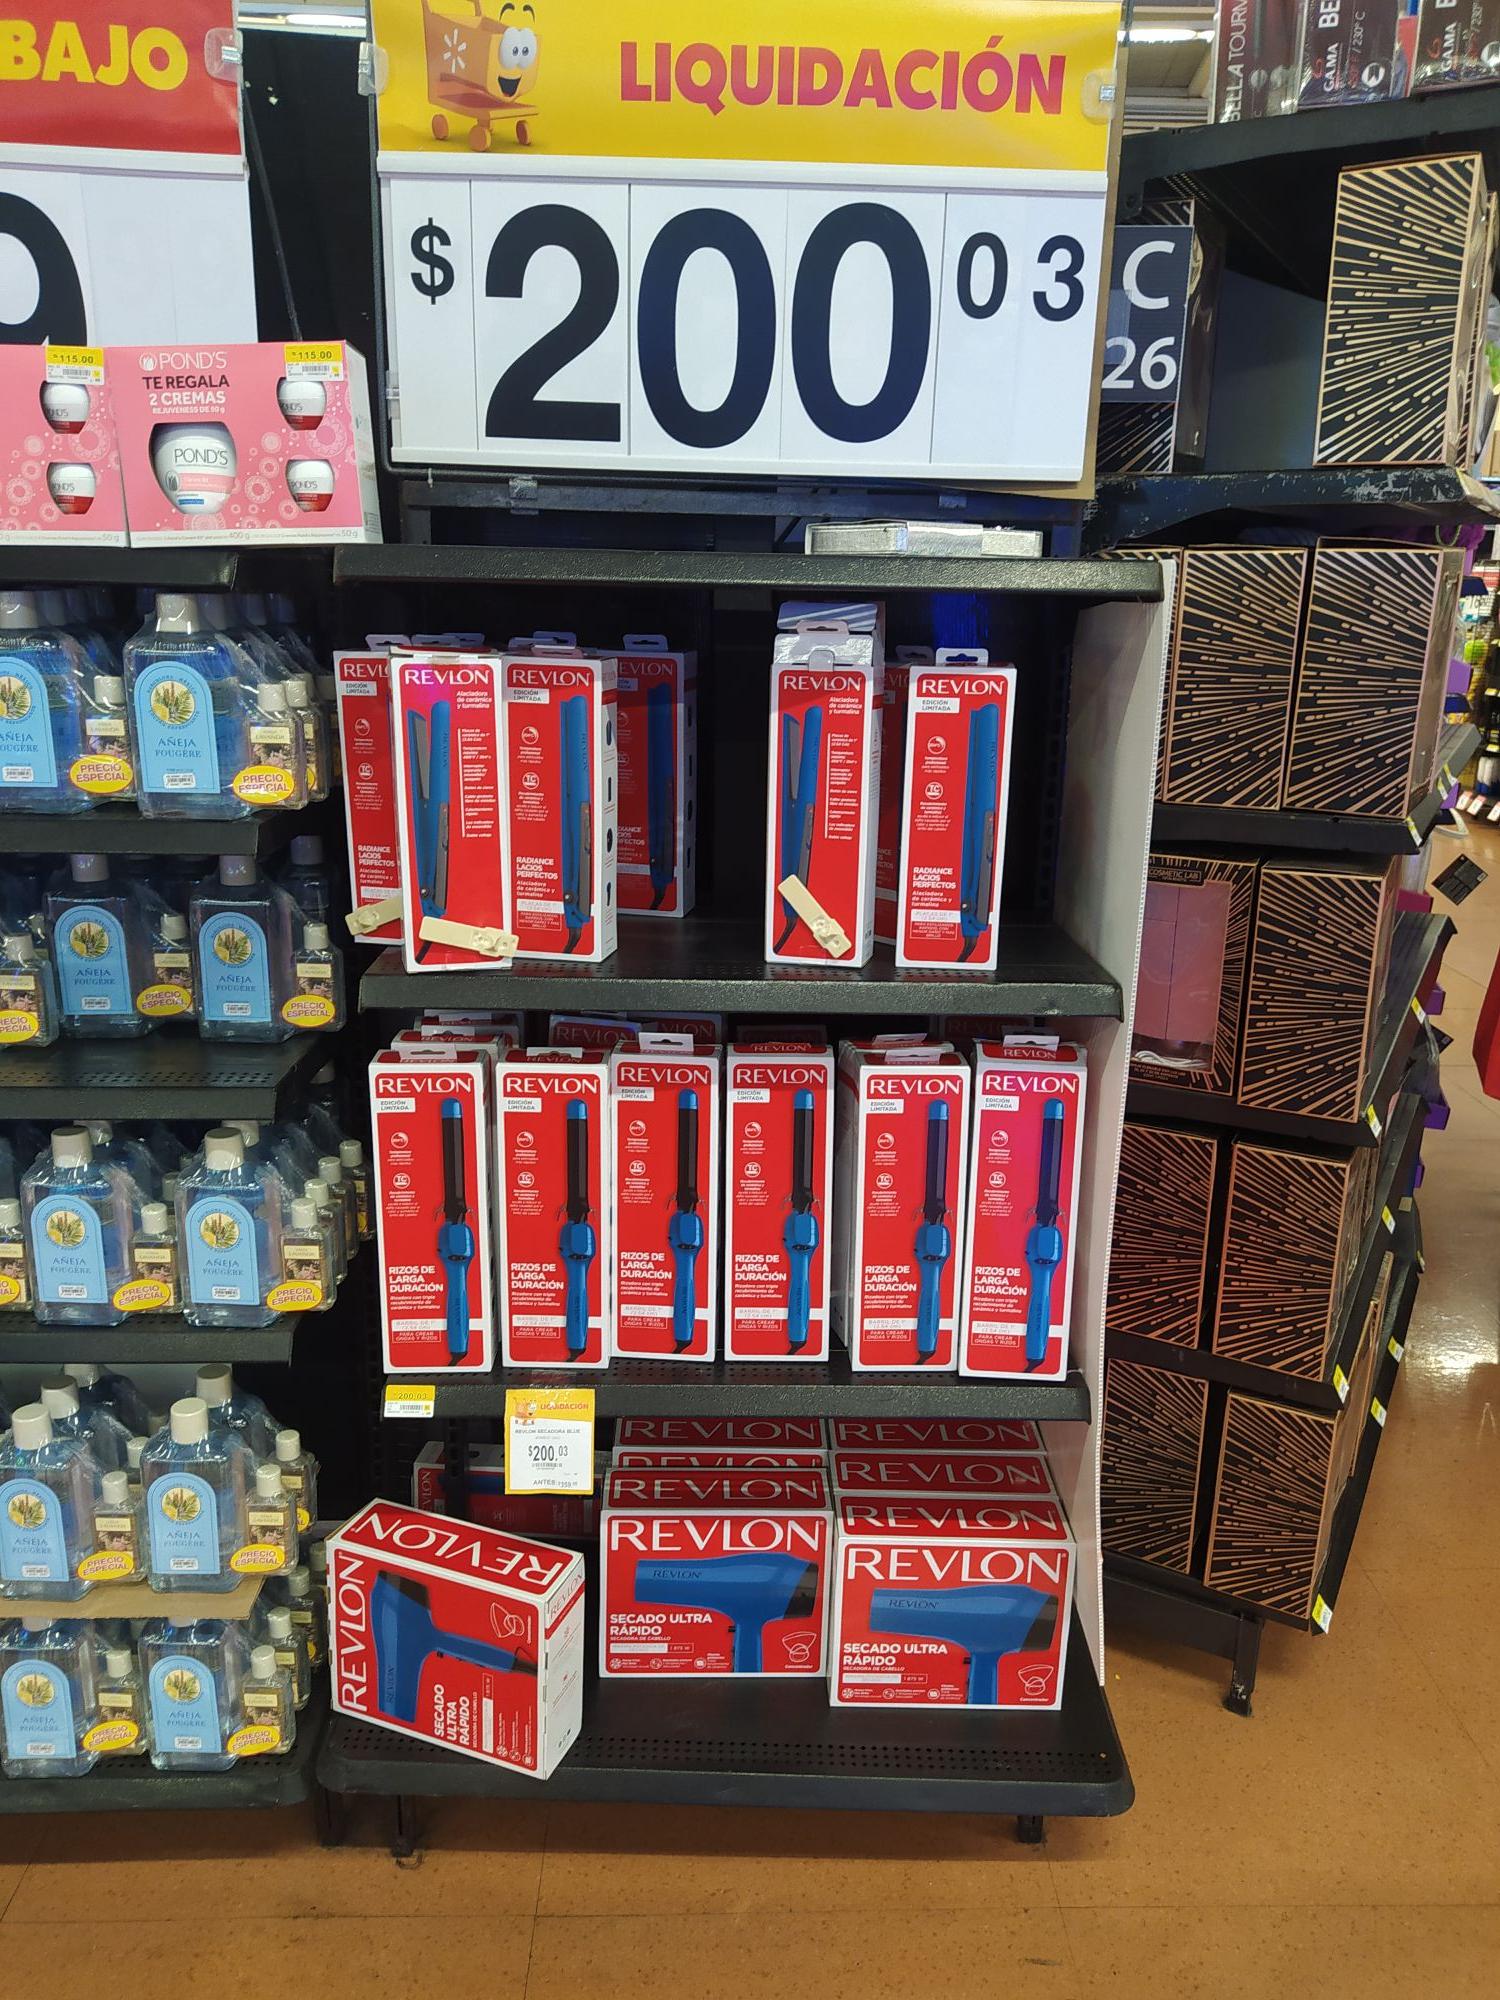 Walmart: Secadora o plancha Revlon en liquidación